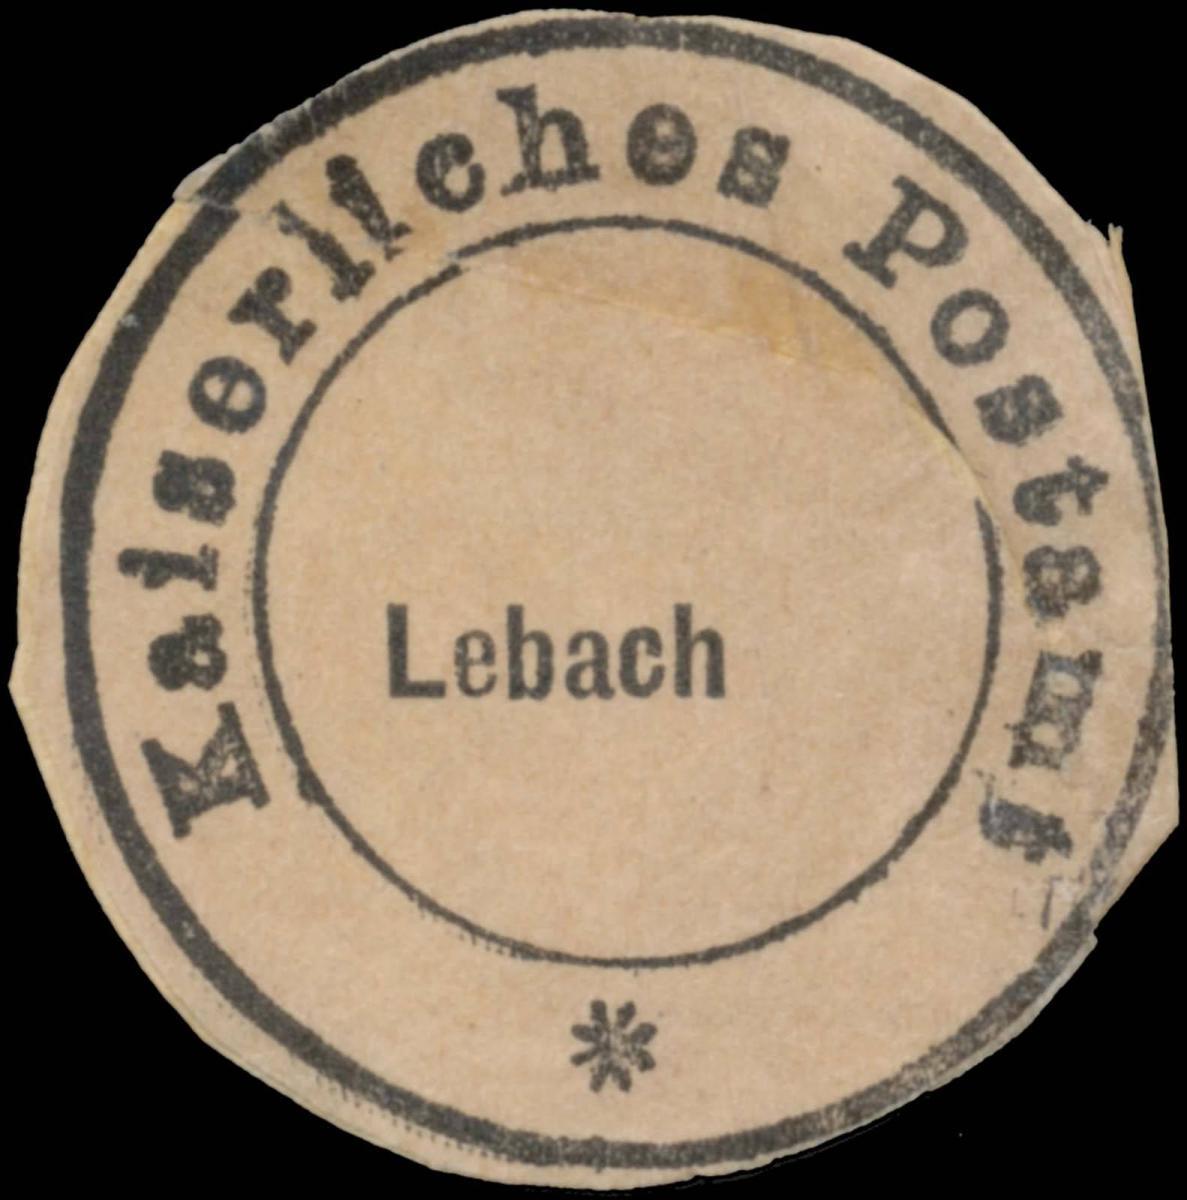 K. Postamt Lebach